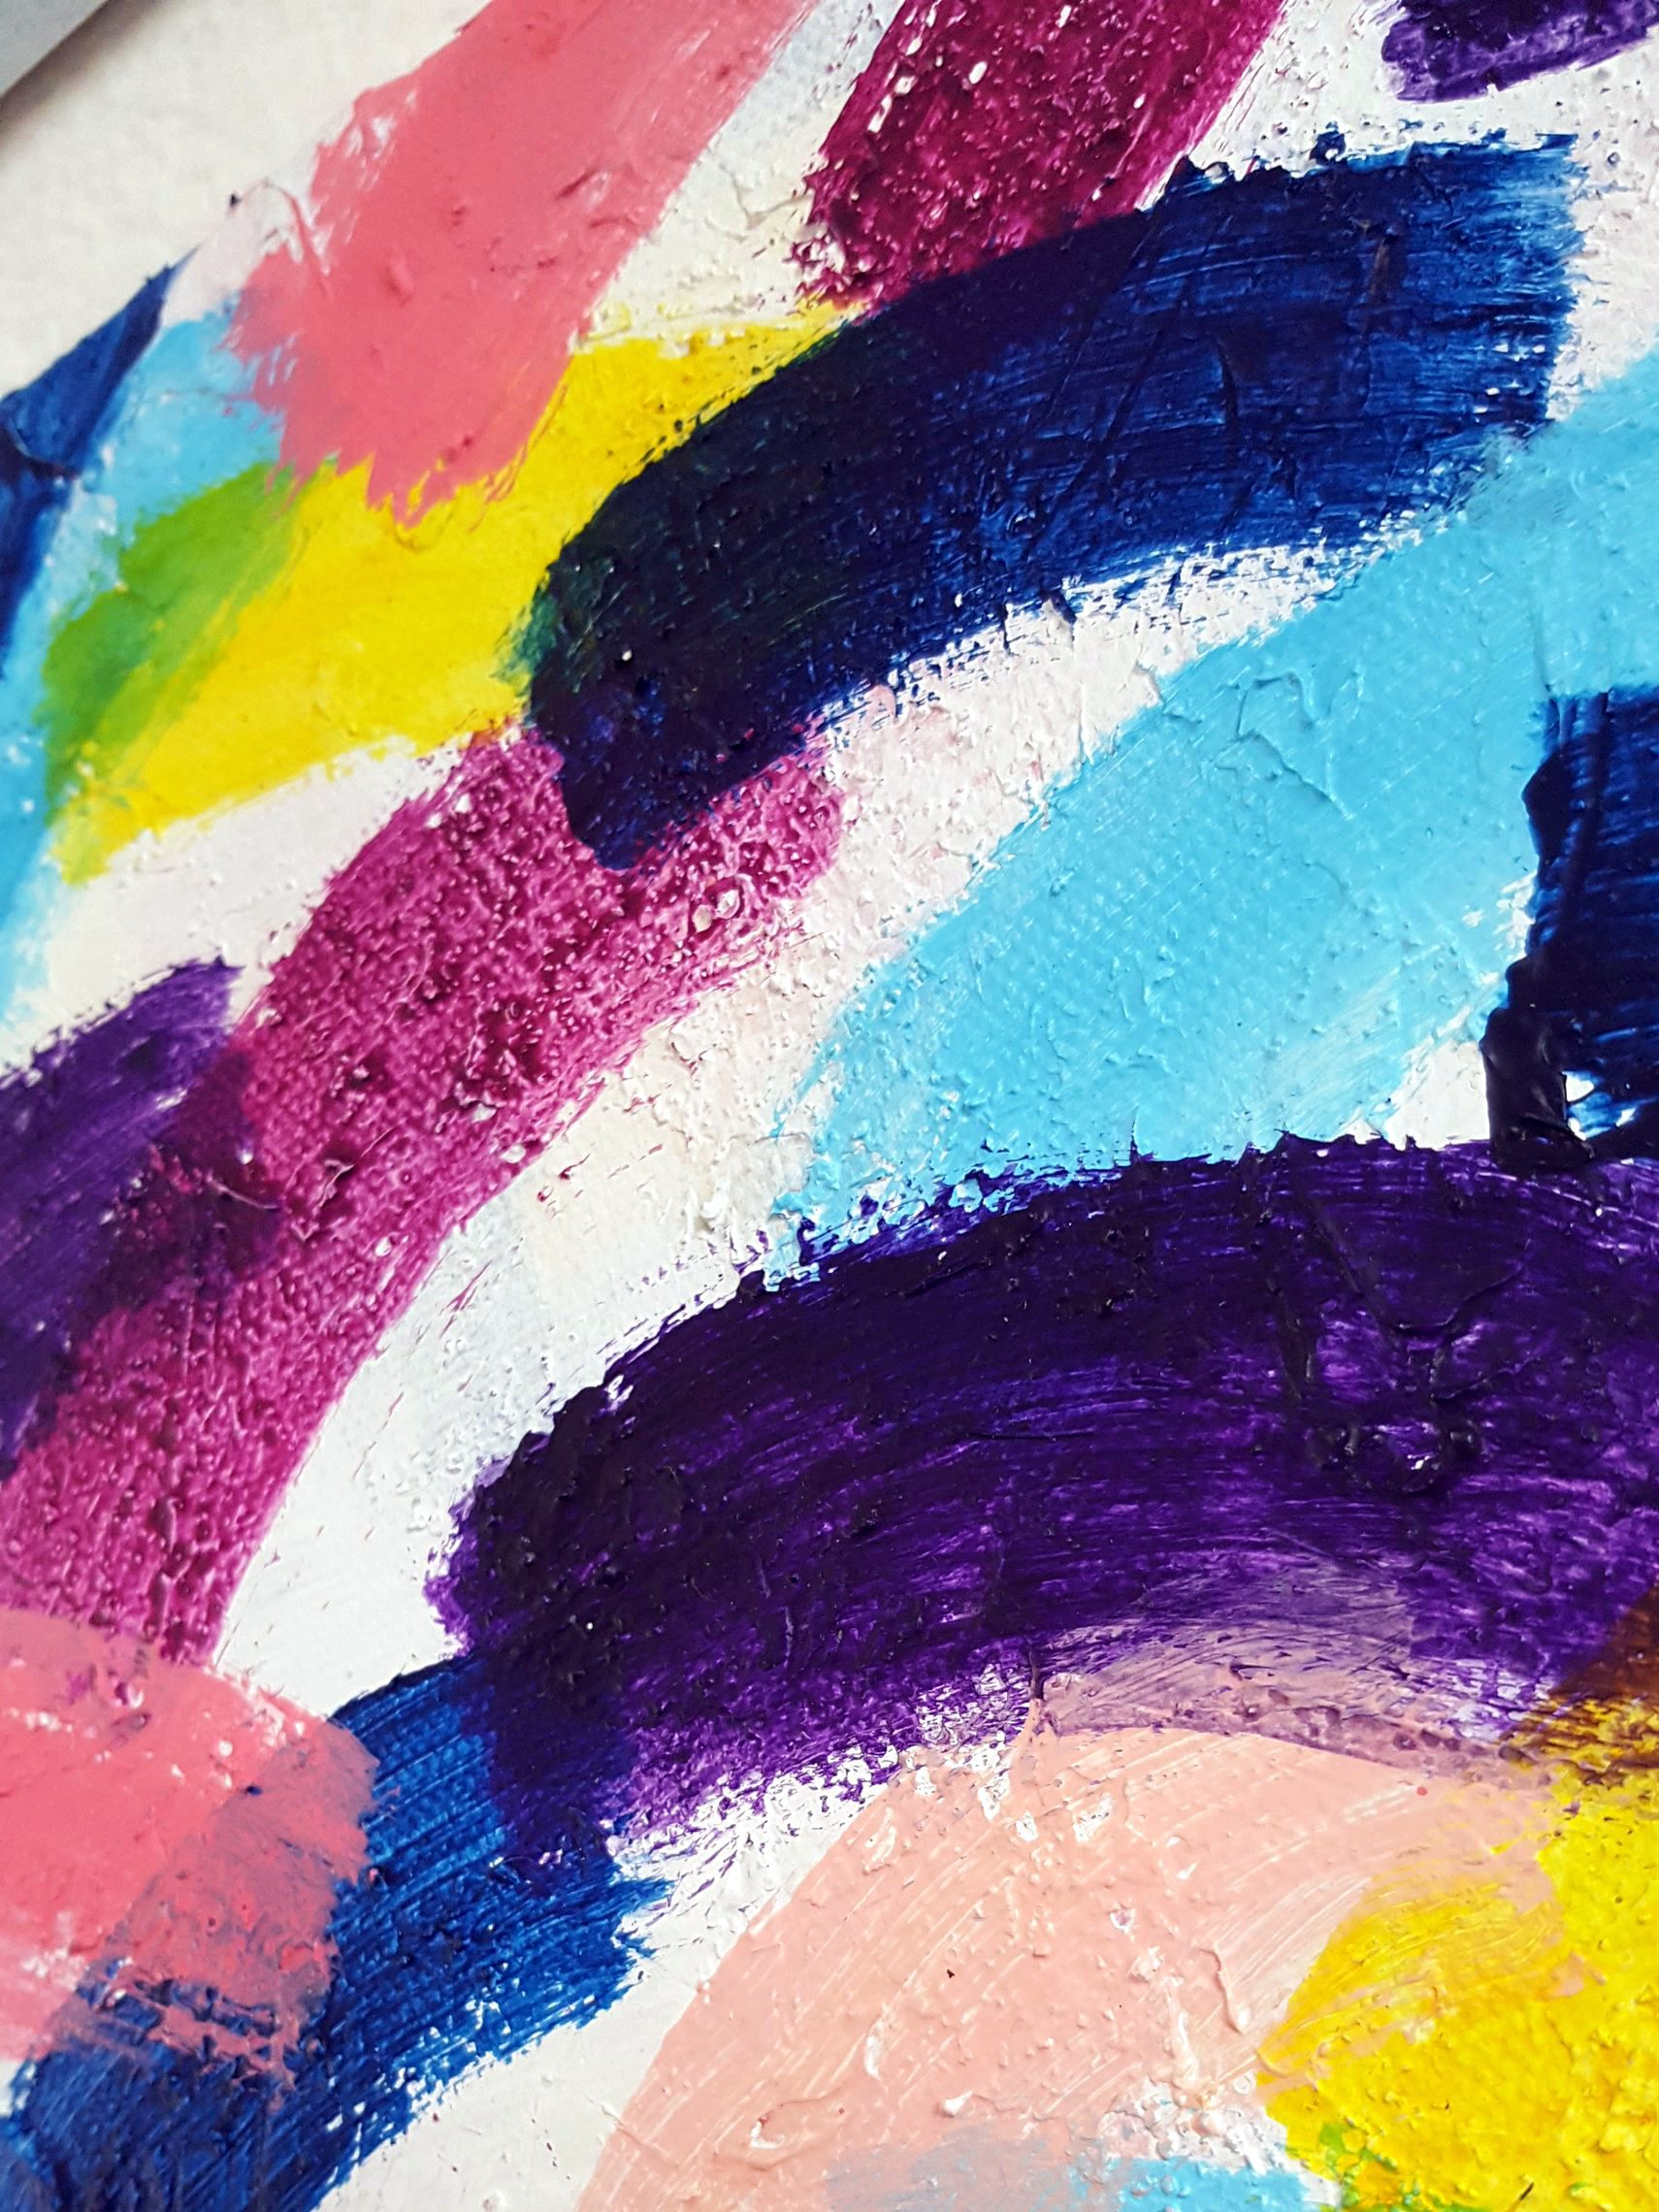 elisa-liu-art-light-trails-close-up-01.jpg